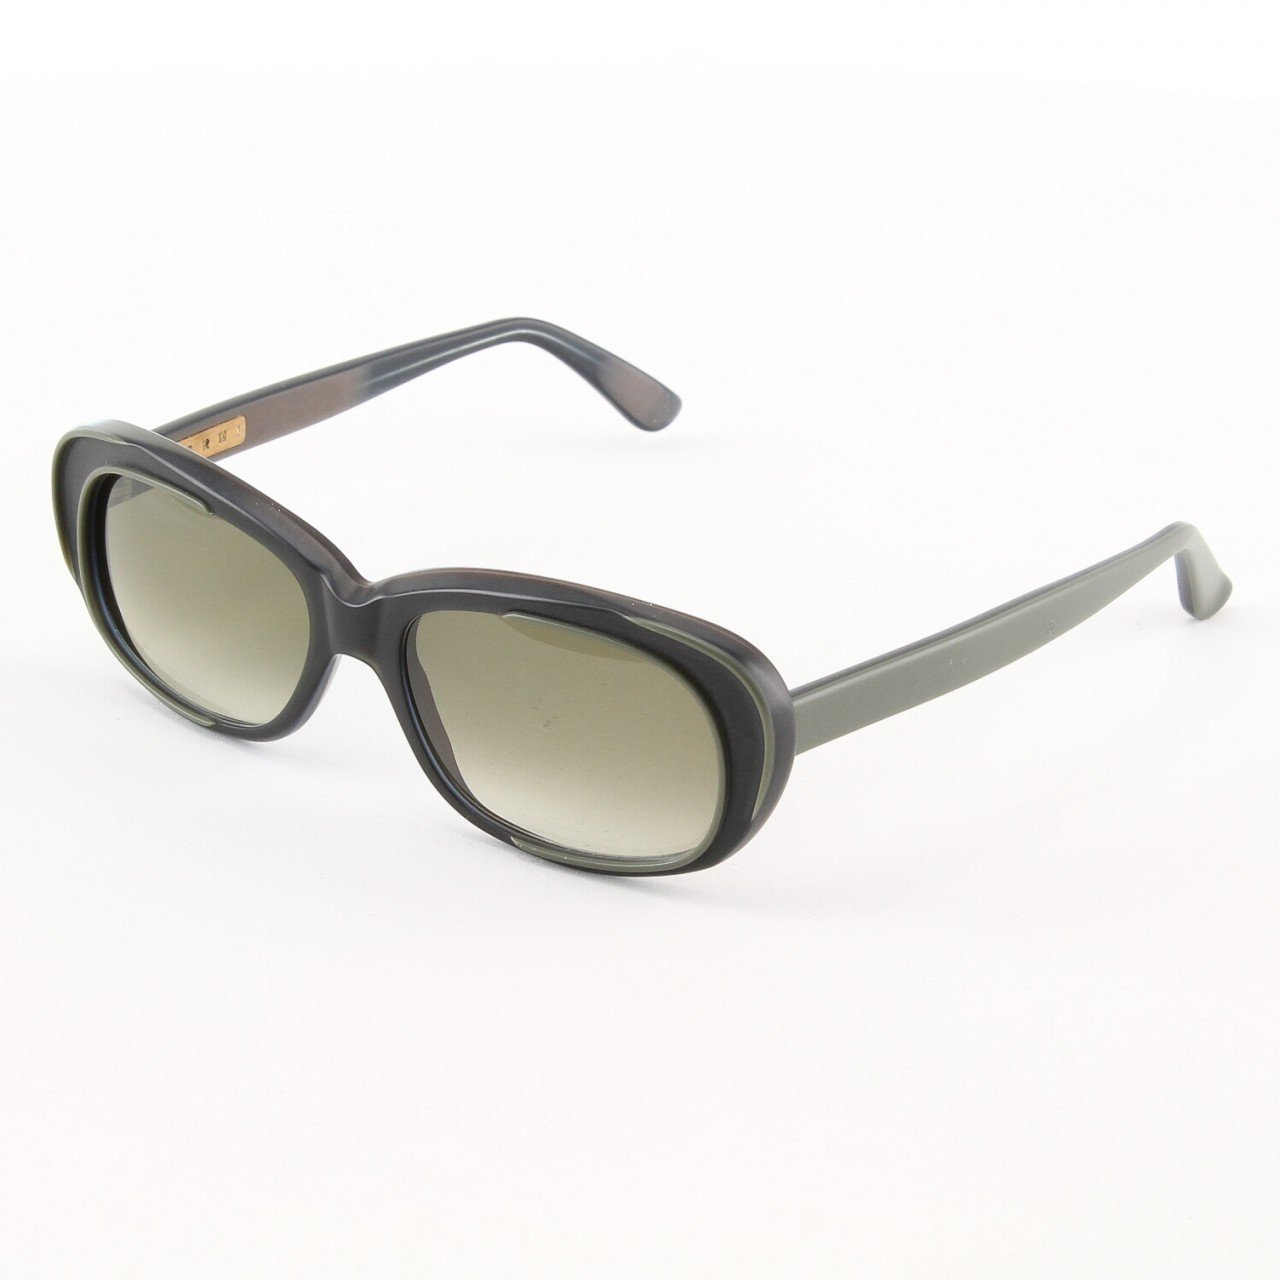 Marni MA174S Sunglasses Col. 01 Graphite Grey w/ Light Grey Frame with Gray Gradient Lenses